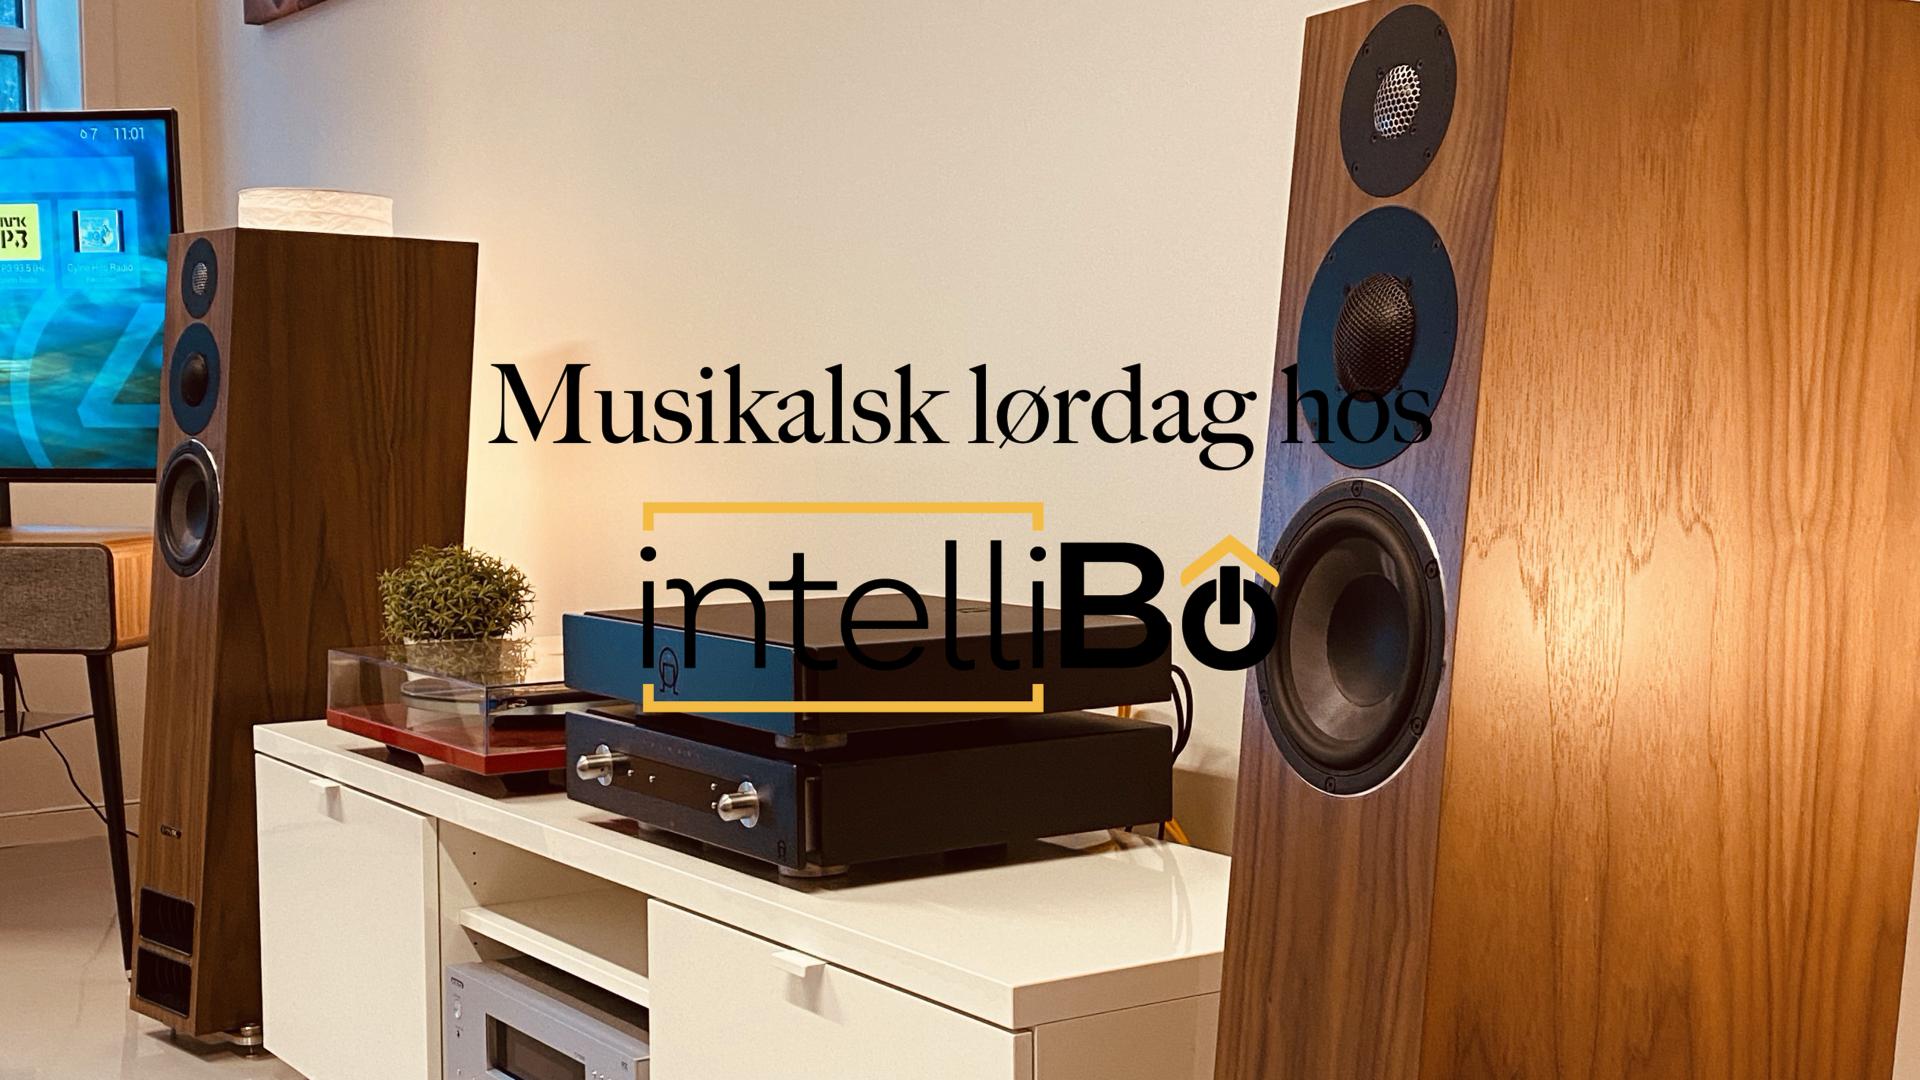 intellibo_musikalsklørdag-event.png